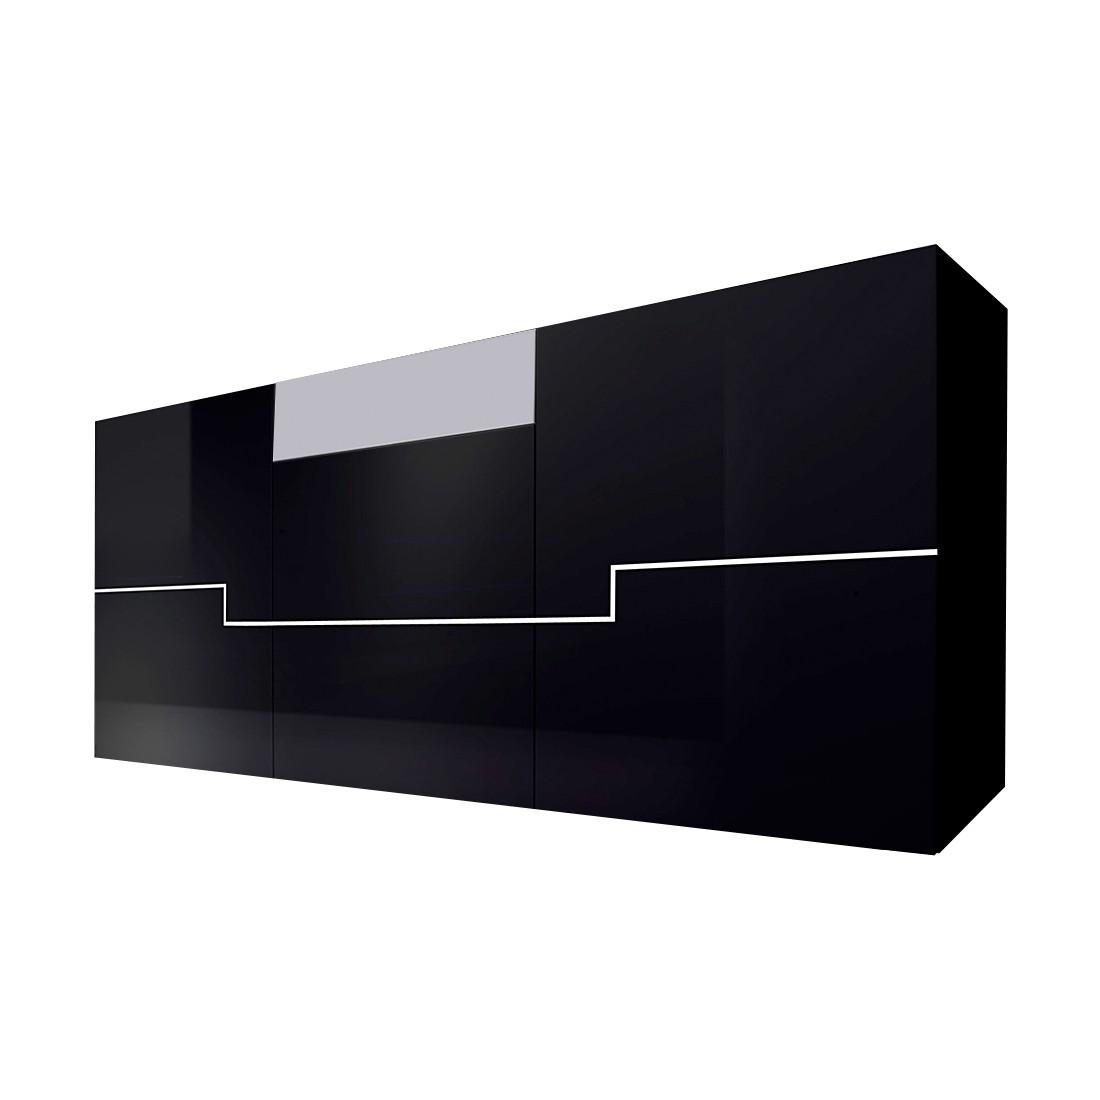 hochglanz sideboard g nstig kaufen. Black Bedroom Furniture Sets. Home Design Ideas